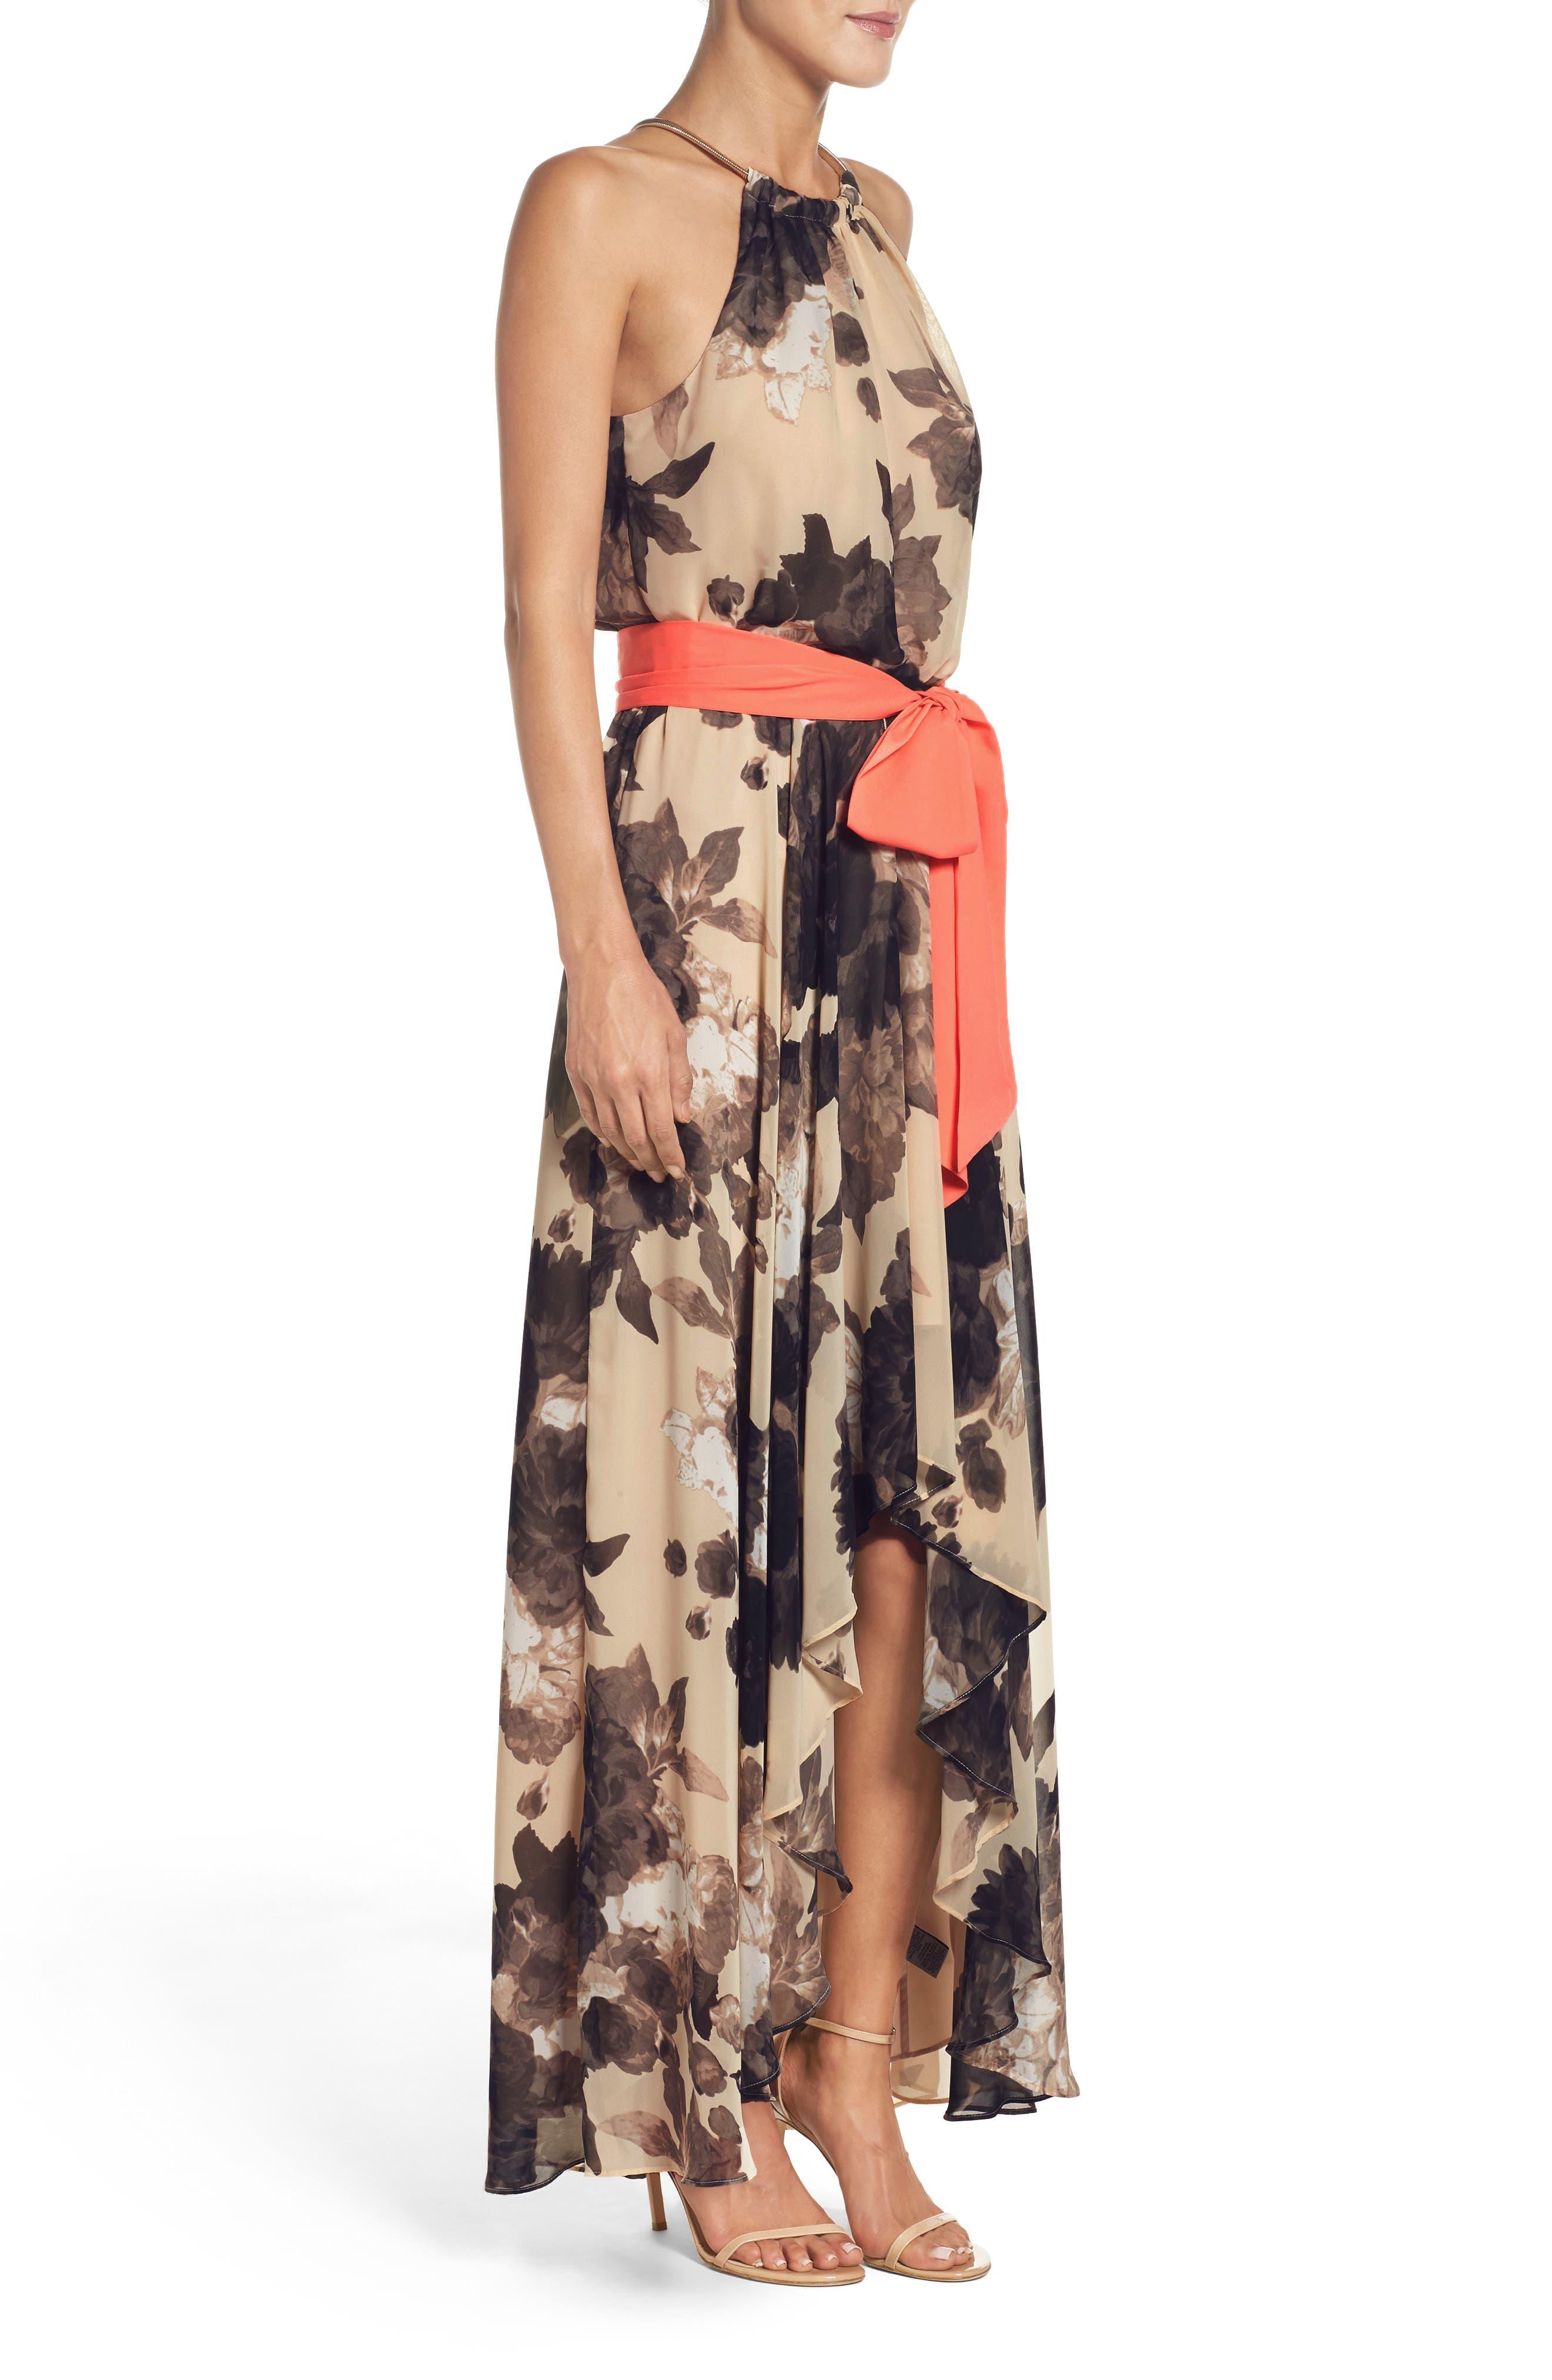 ELIZA J, Floral Print Halter Chiffon Maxi Dress, Alternate thumbnail 4, color, 250